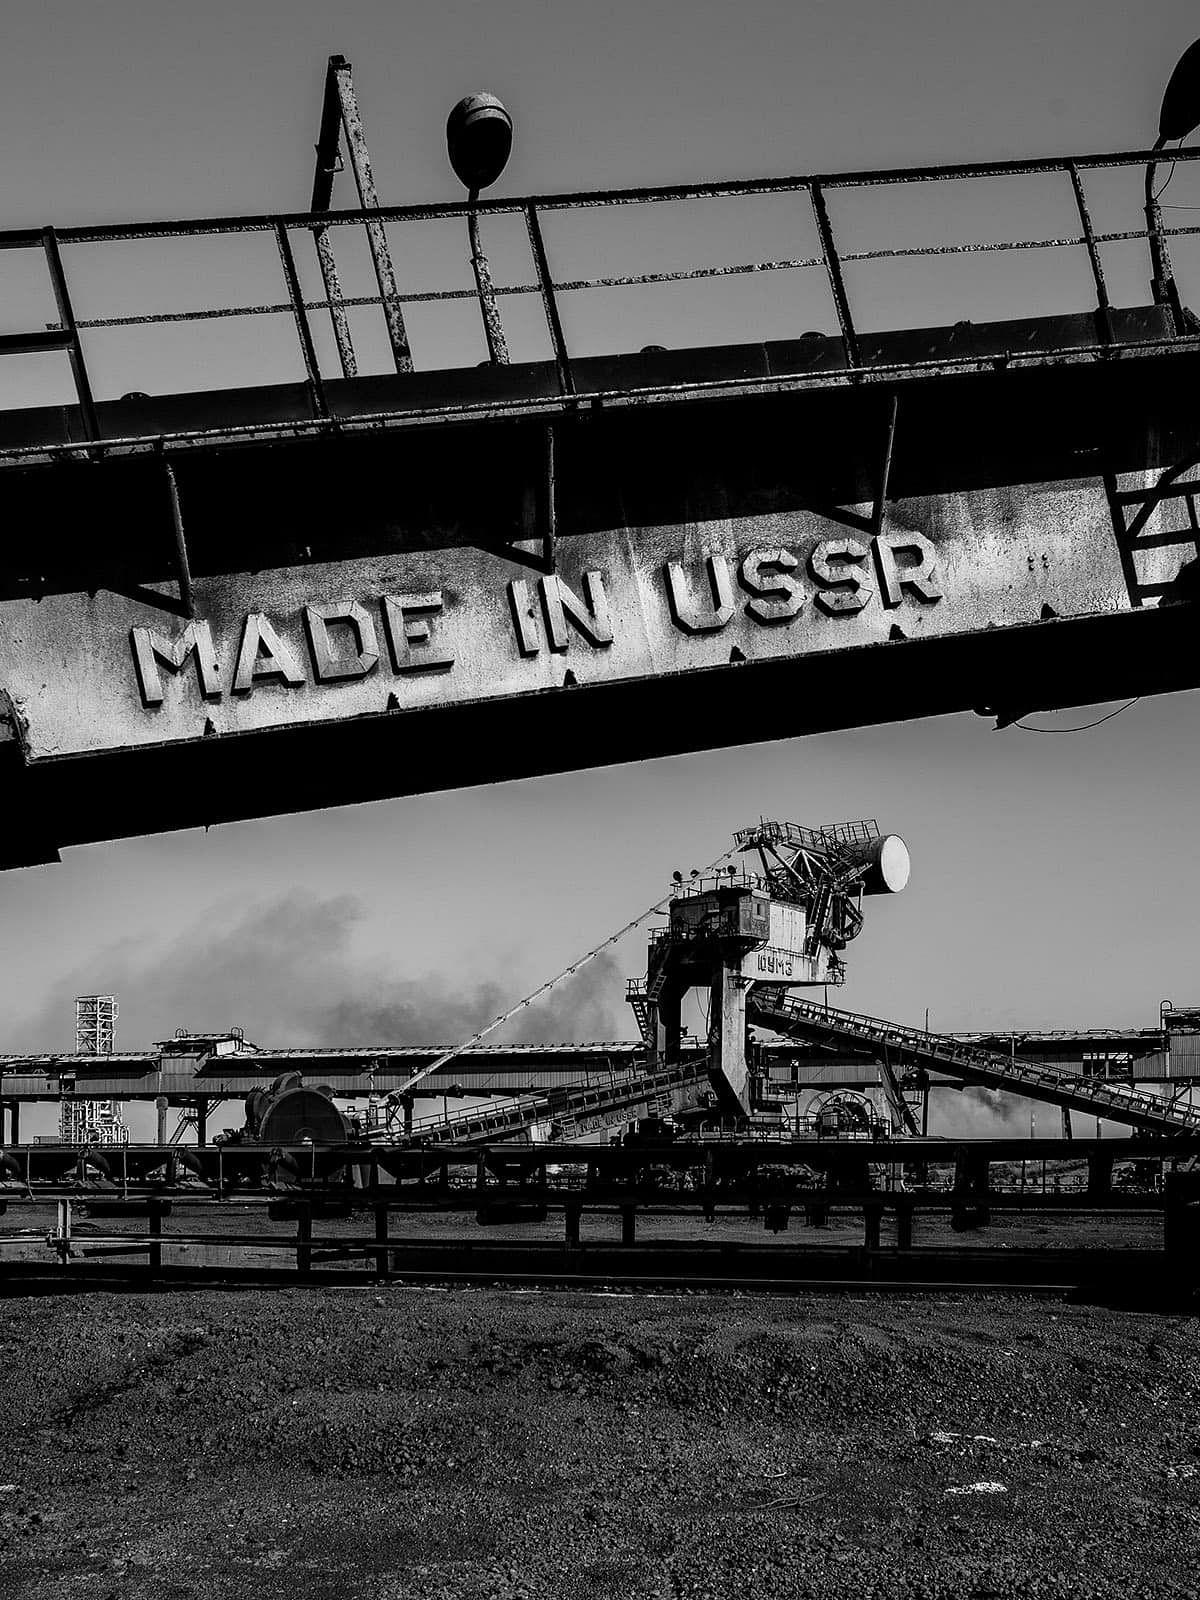 Russians to Submit Proposal or Modernization of Pakistan SteelMill